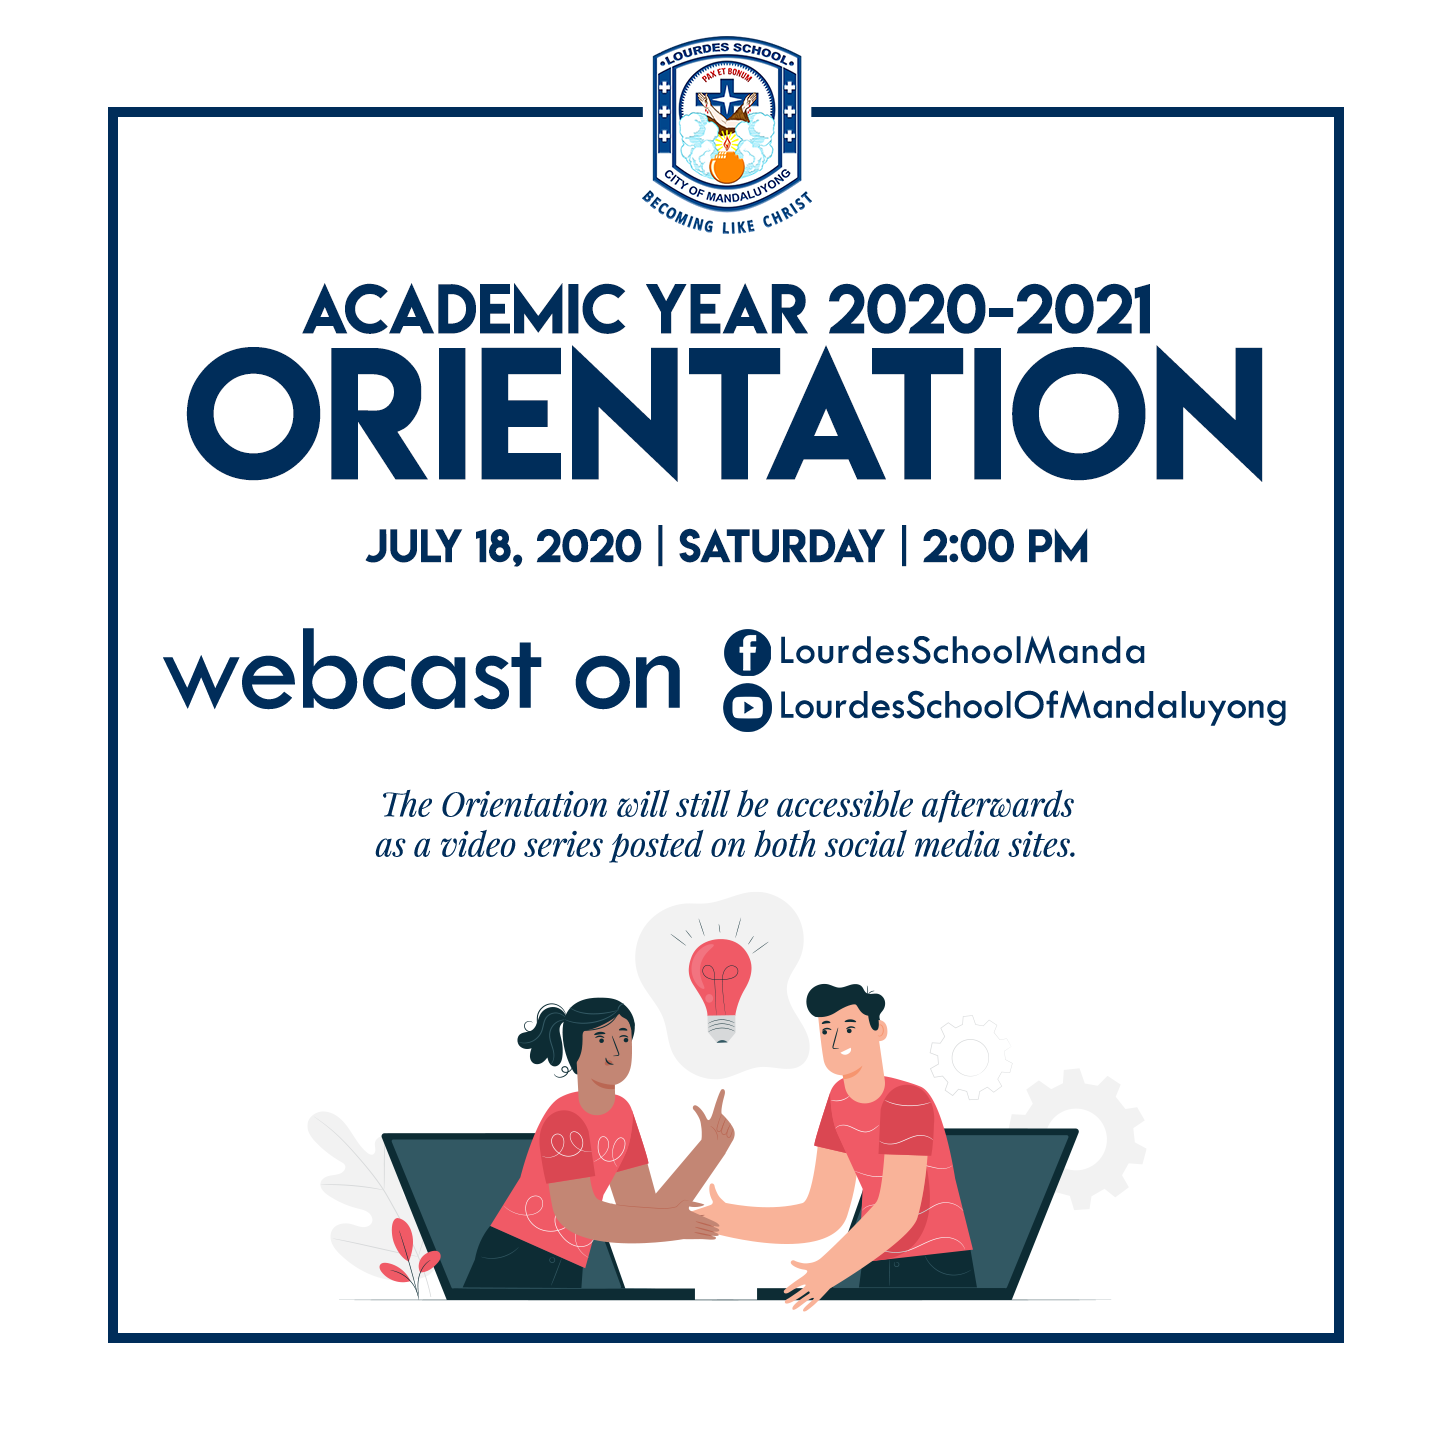 Academic Year 2k20 - 2k21 Orientation